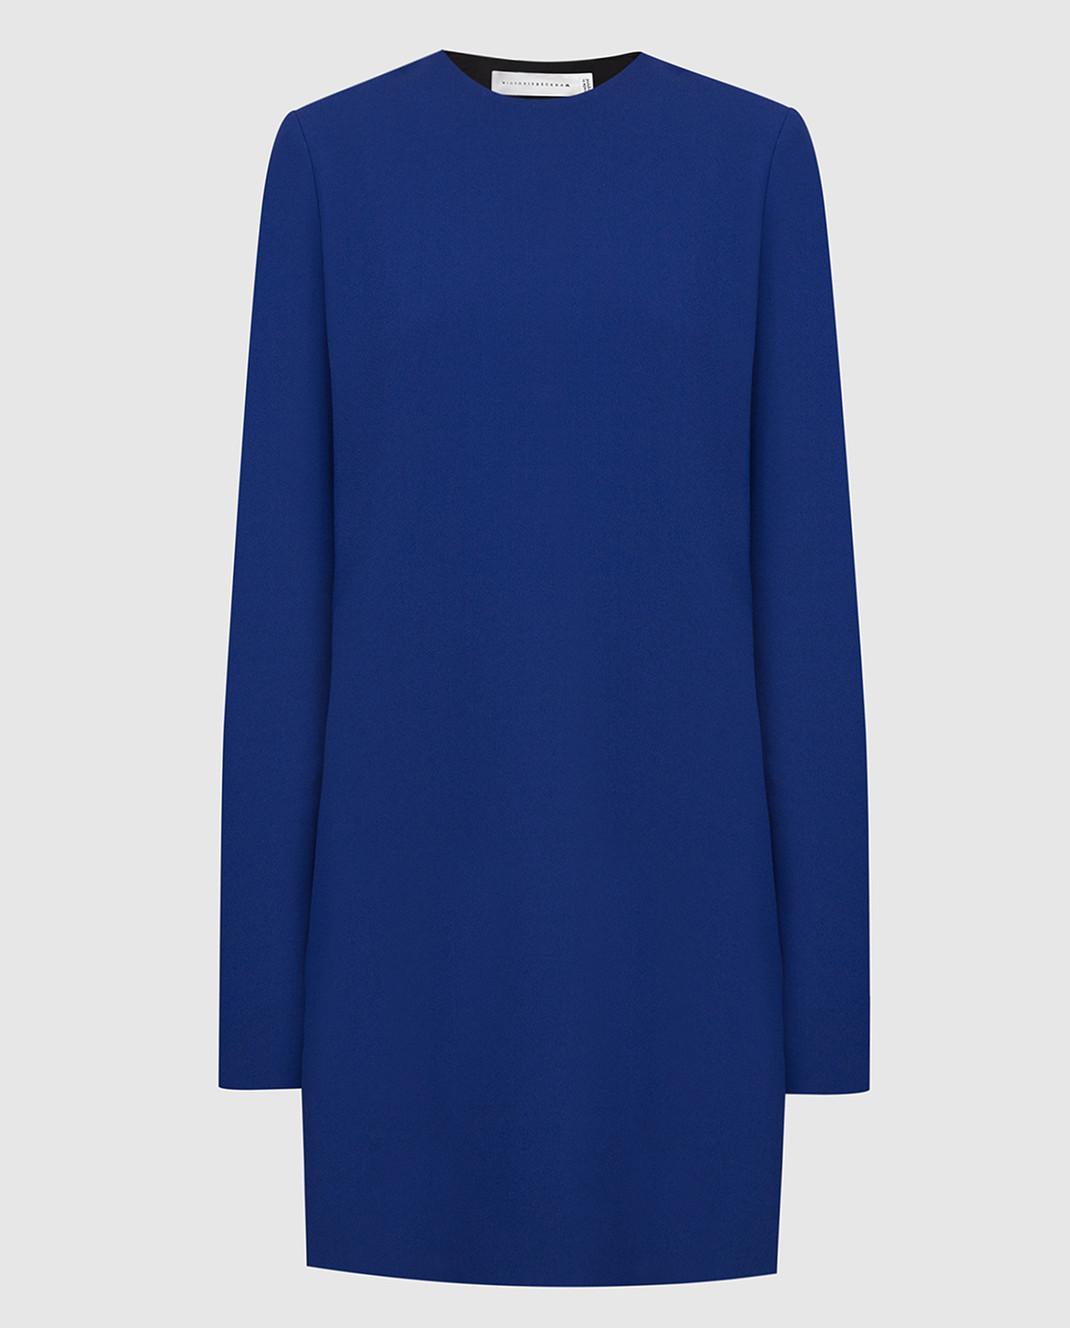 Victoria Beckham Синее платье 517